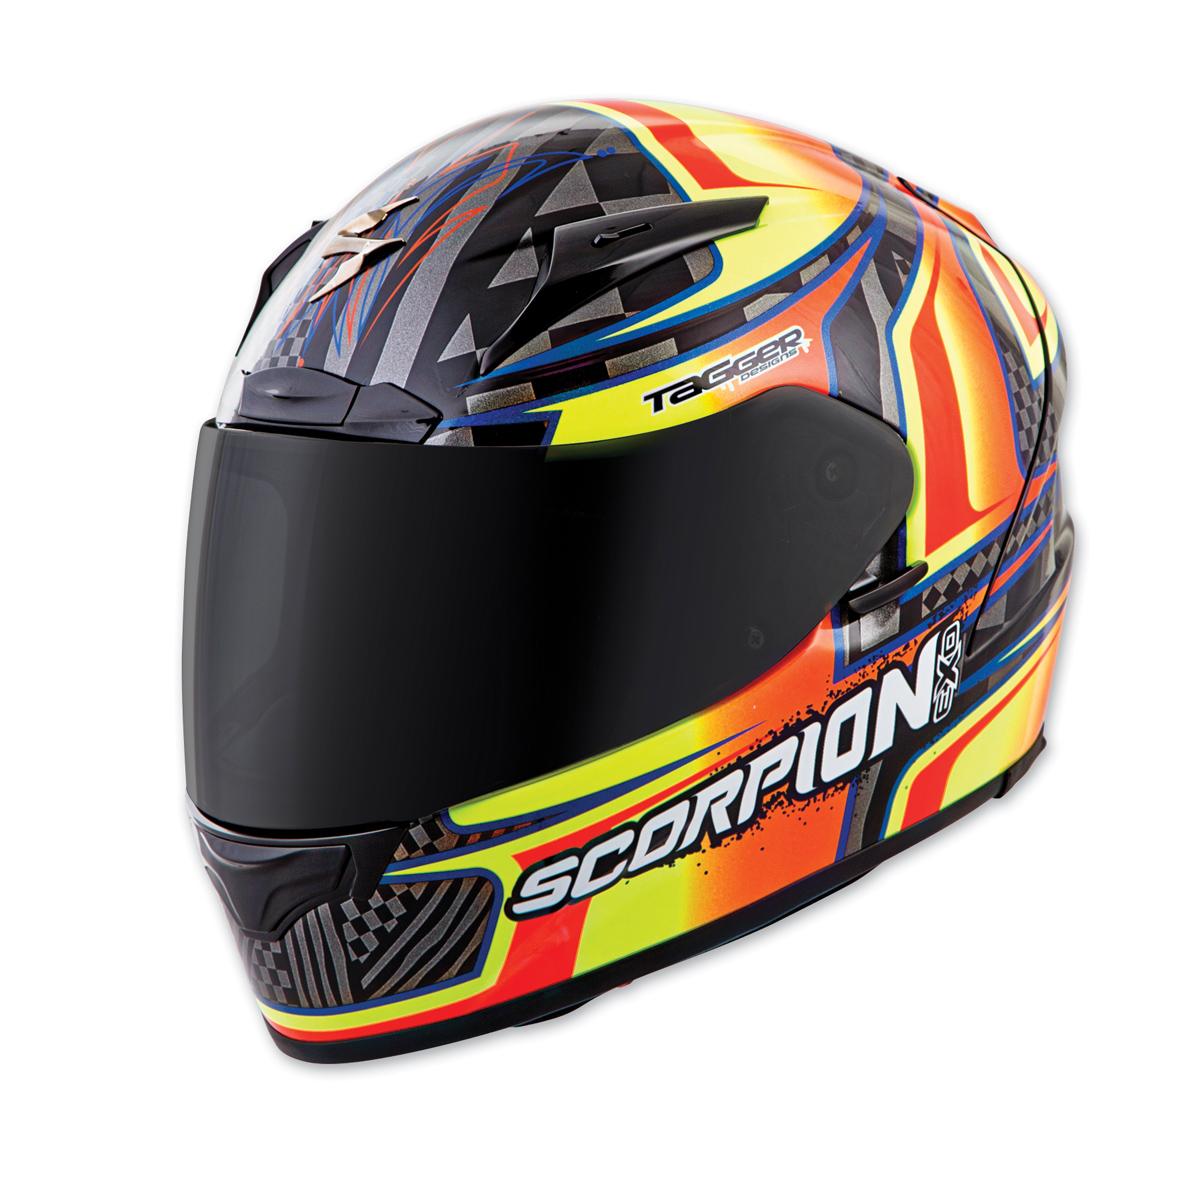 Scorpion EXO EXO-R2000 Esenada Full Face Helmet